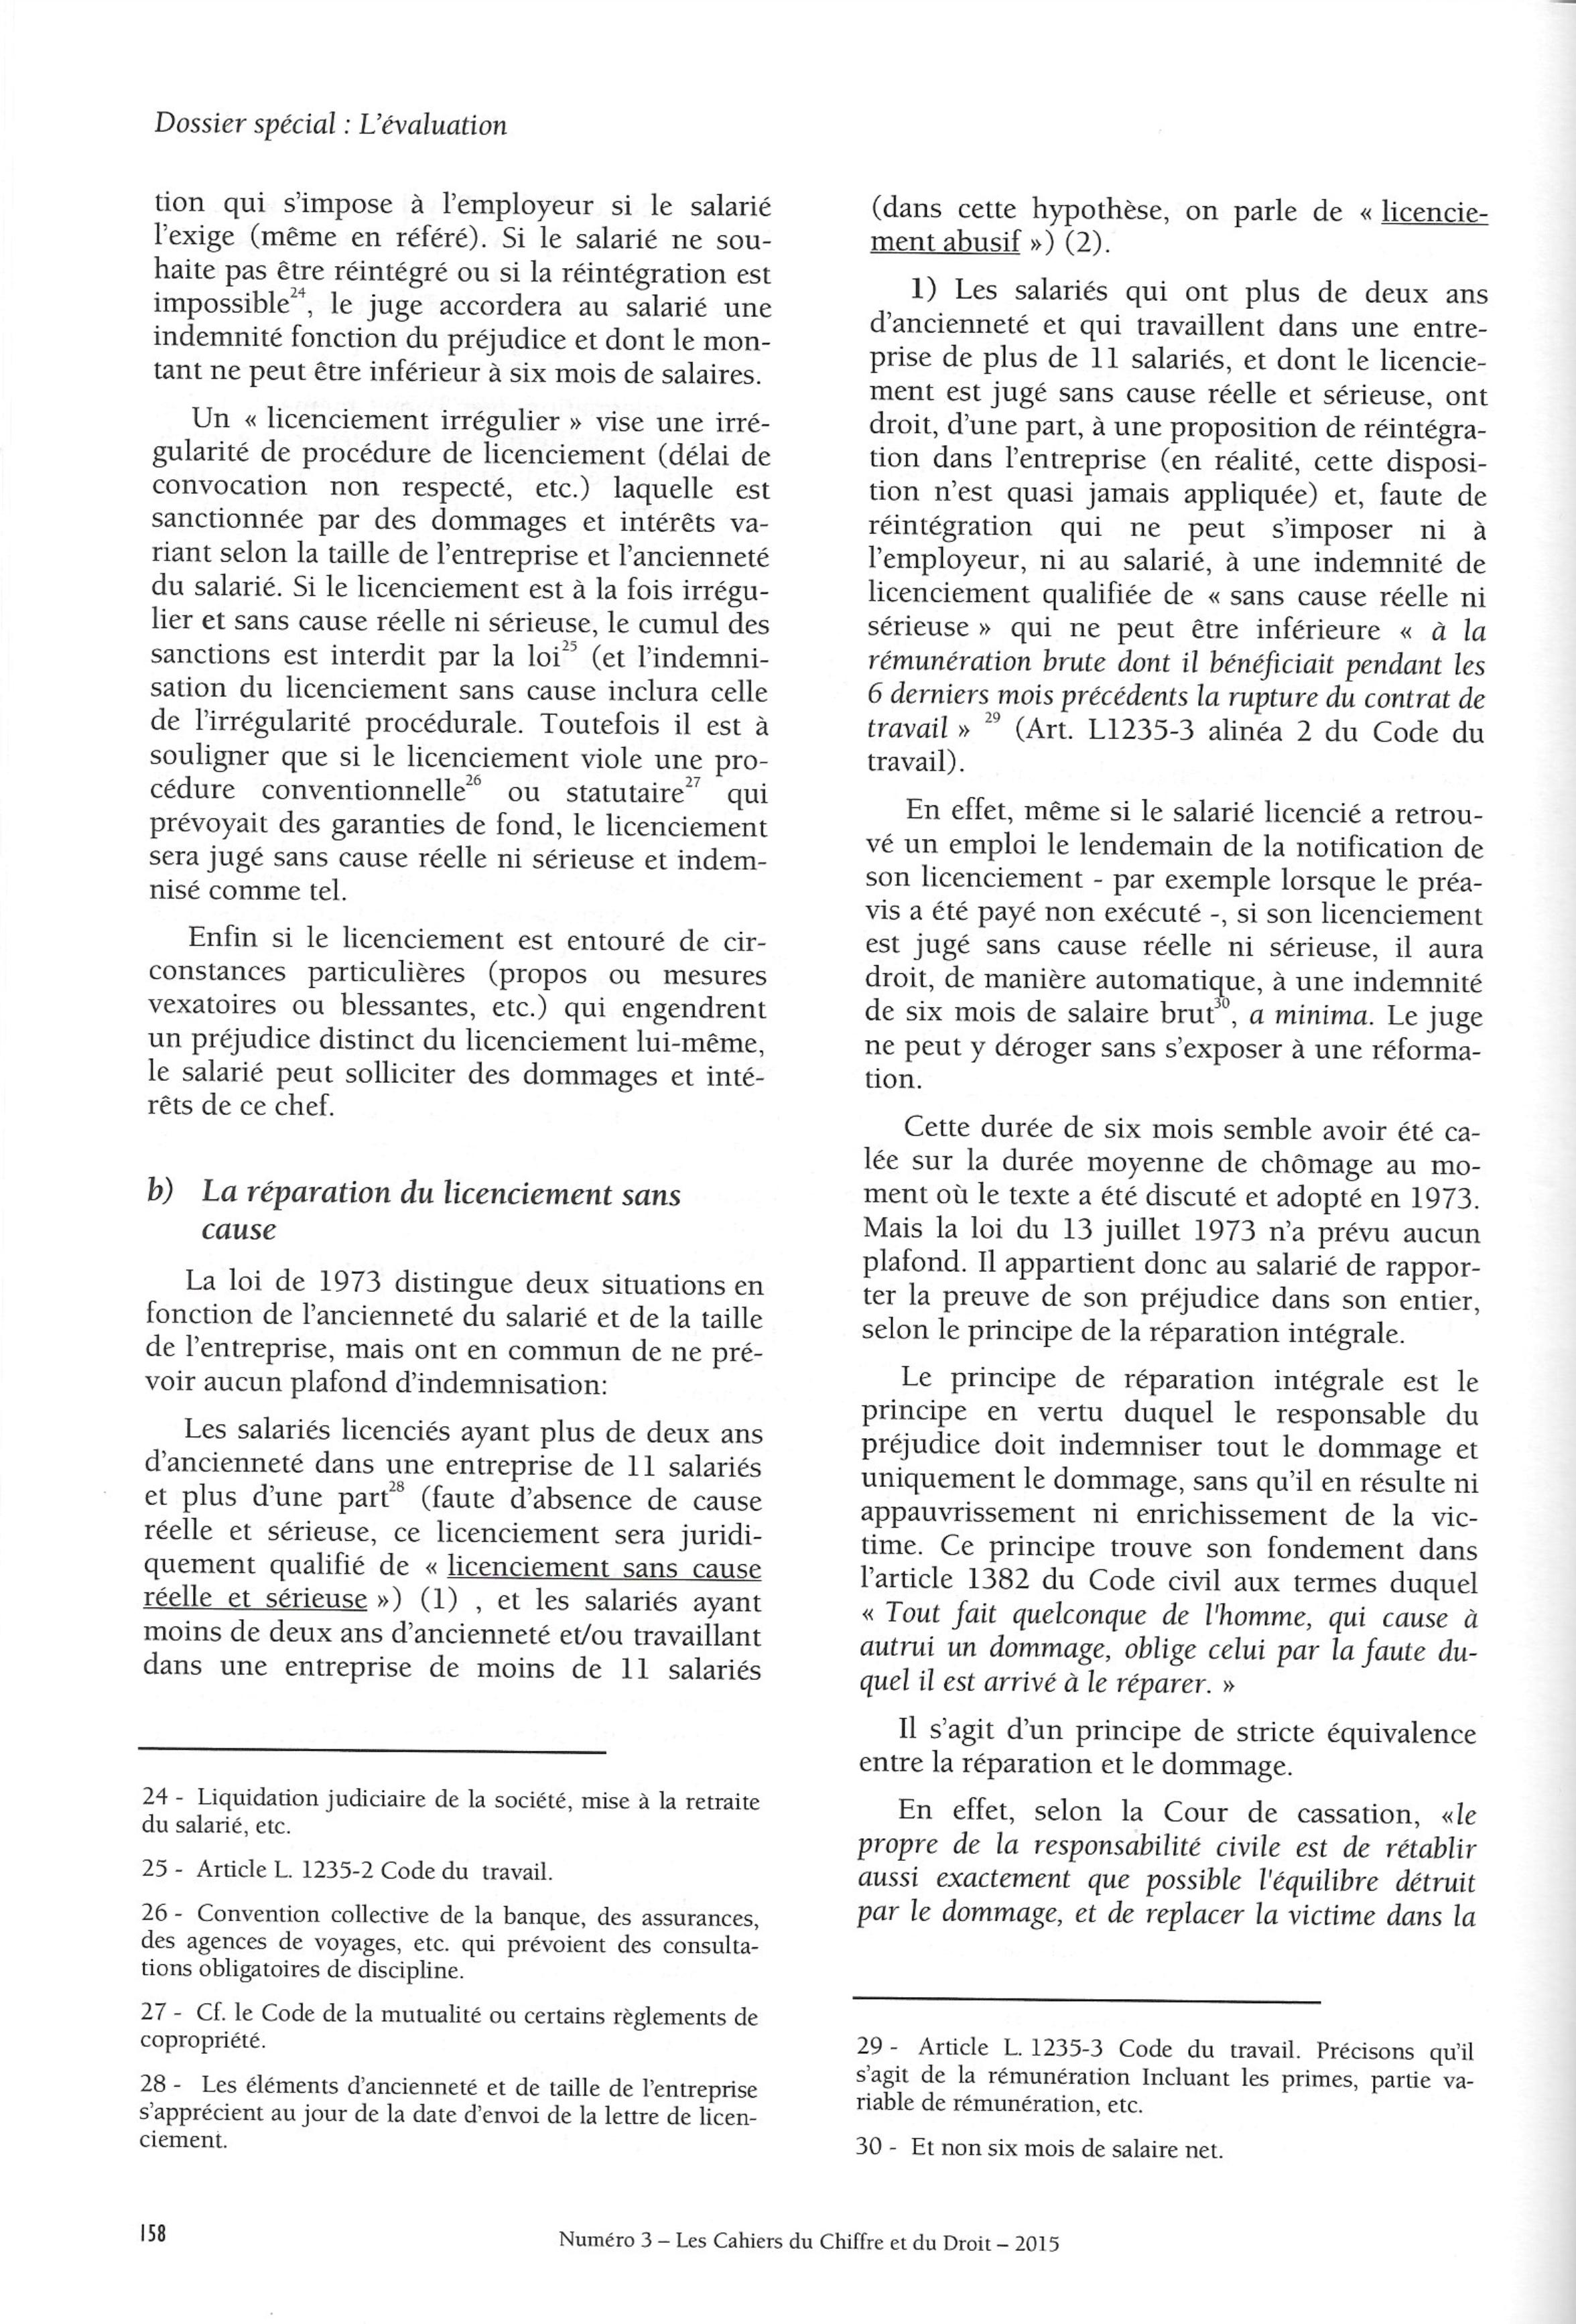 code du travail 1235-3